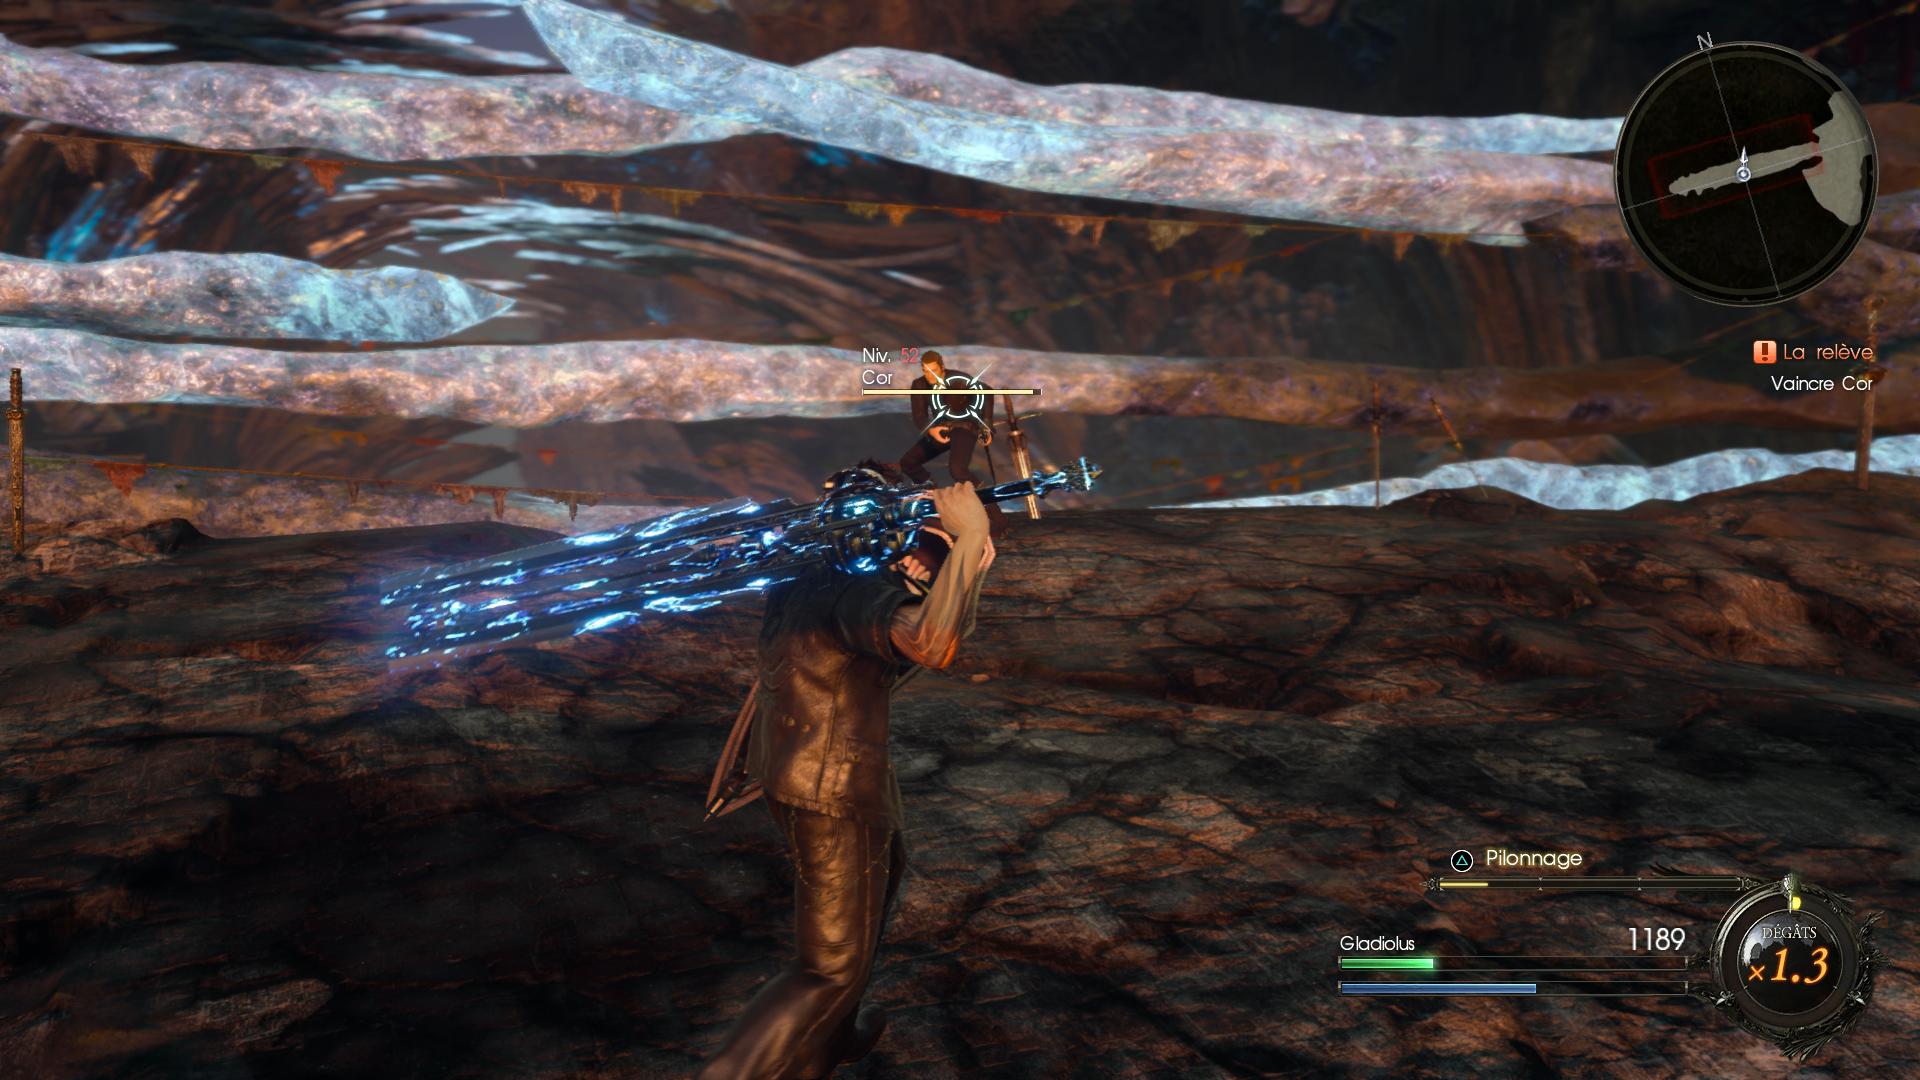 Xbox One Final Fantasy XV - Episode: Gladiolus